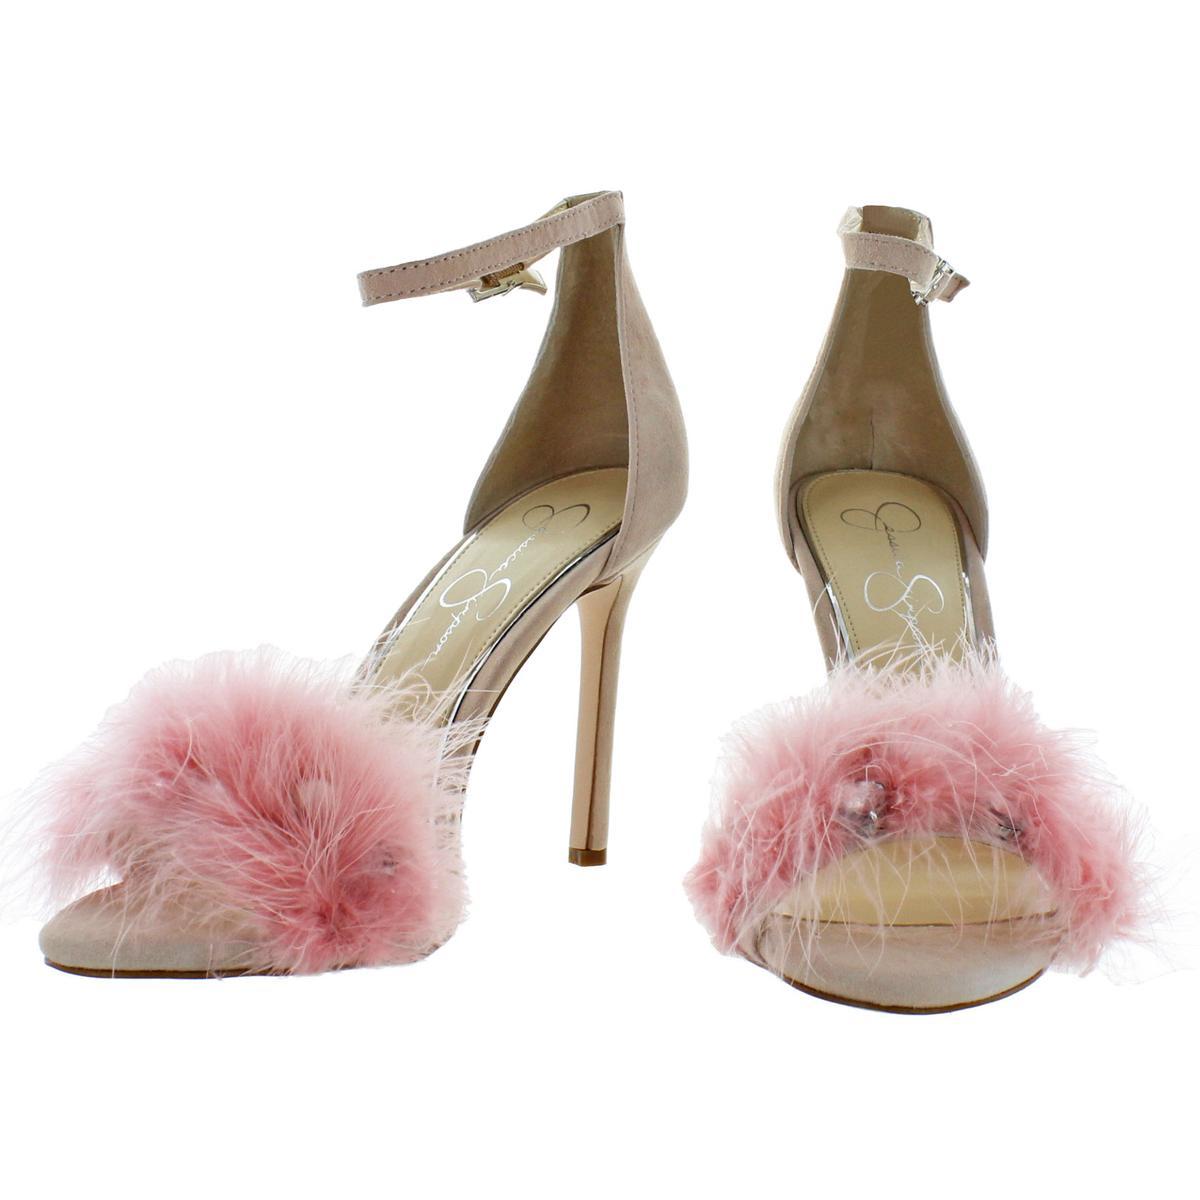 Jessica-Simpson-Womens-Jolinda-Suede-Feather-Dress-Sandals-Shoes-BHFO-8609 thumbnail 6